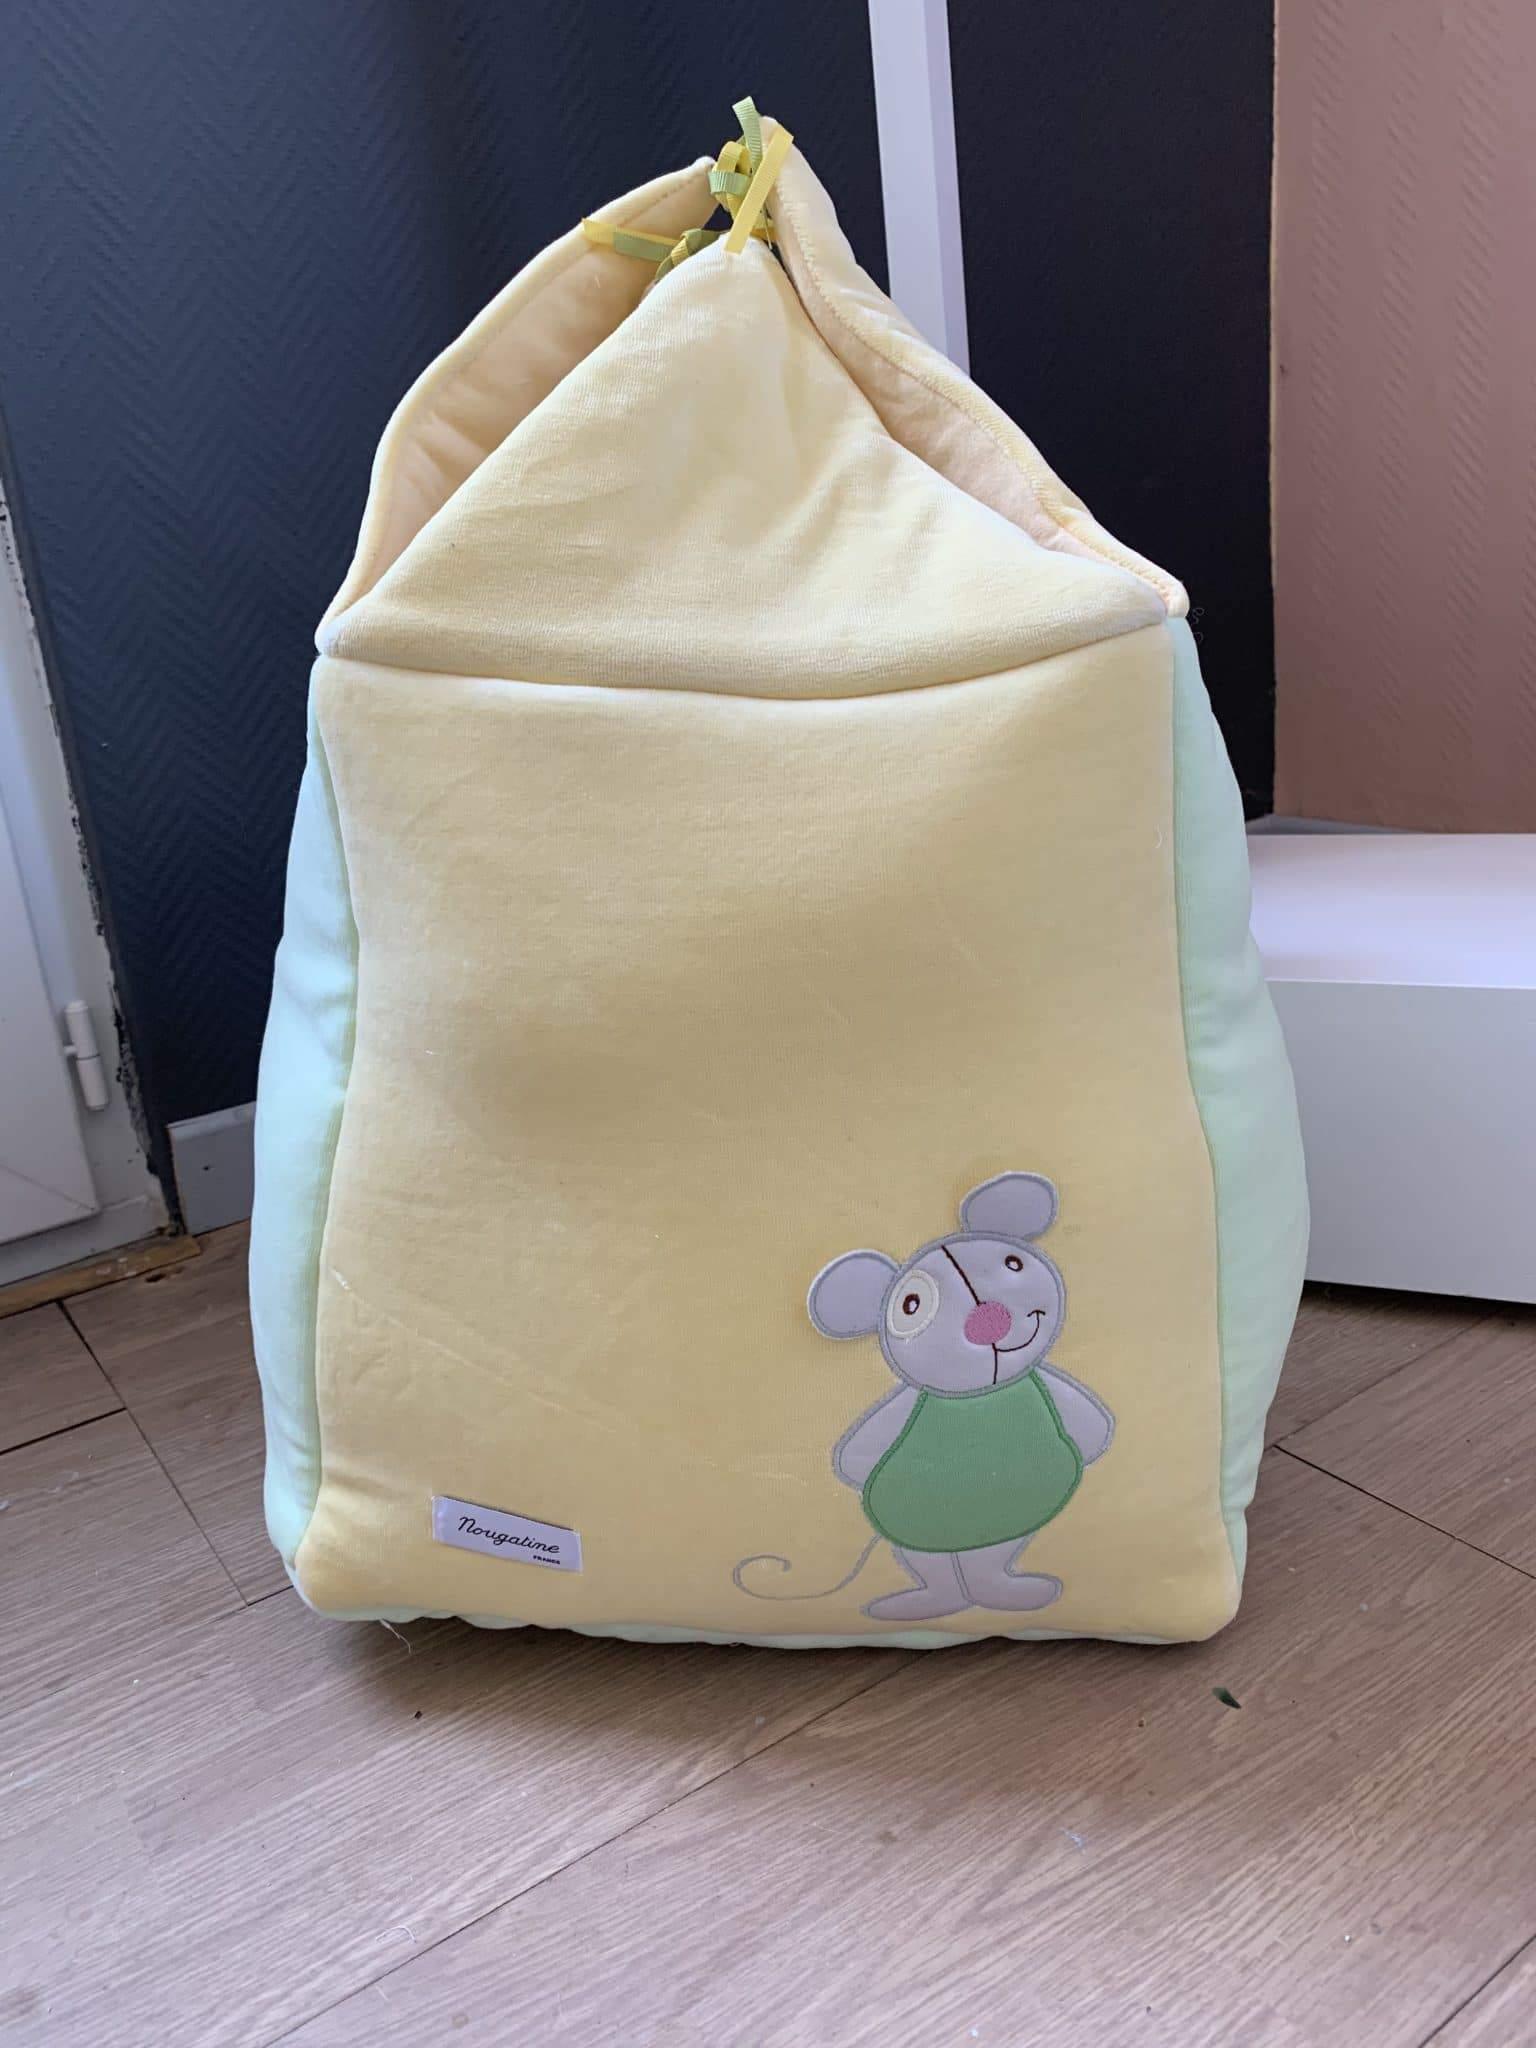 sac à linge souris verte